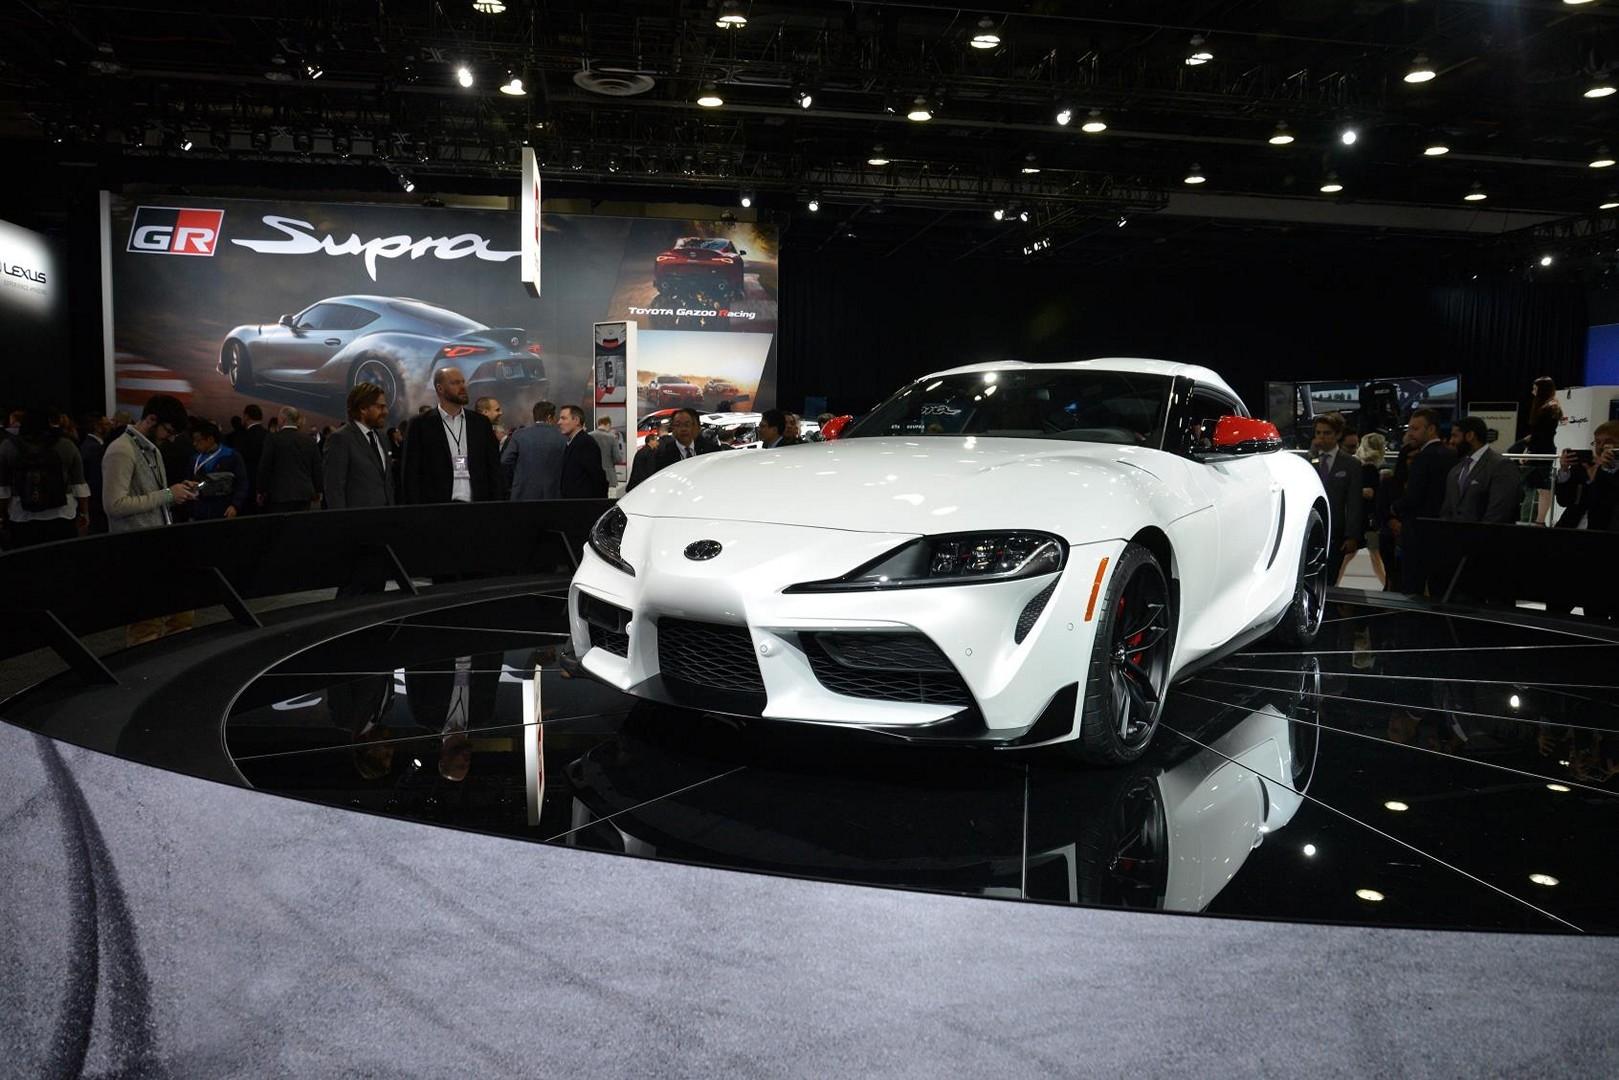 2020 Toyota Supra Lowered On Volk Racing T37 Wheels